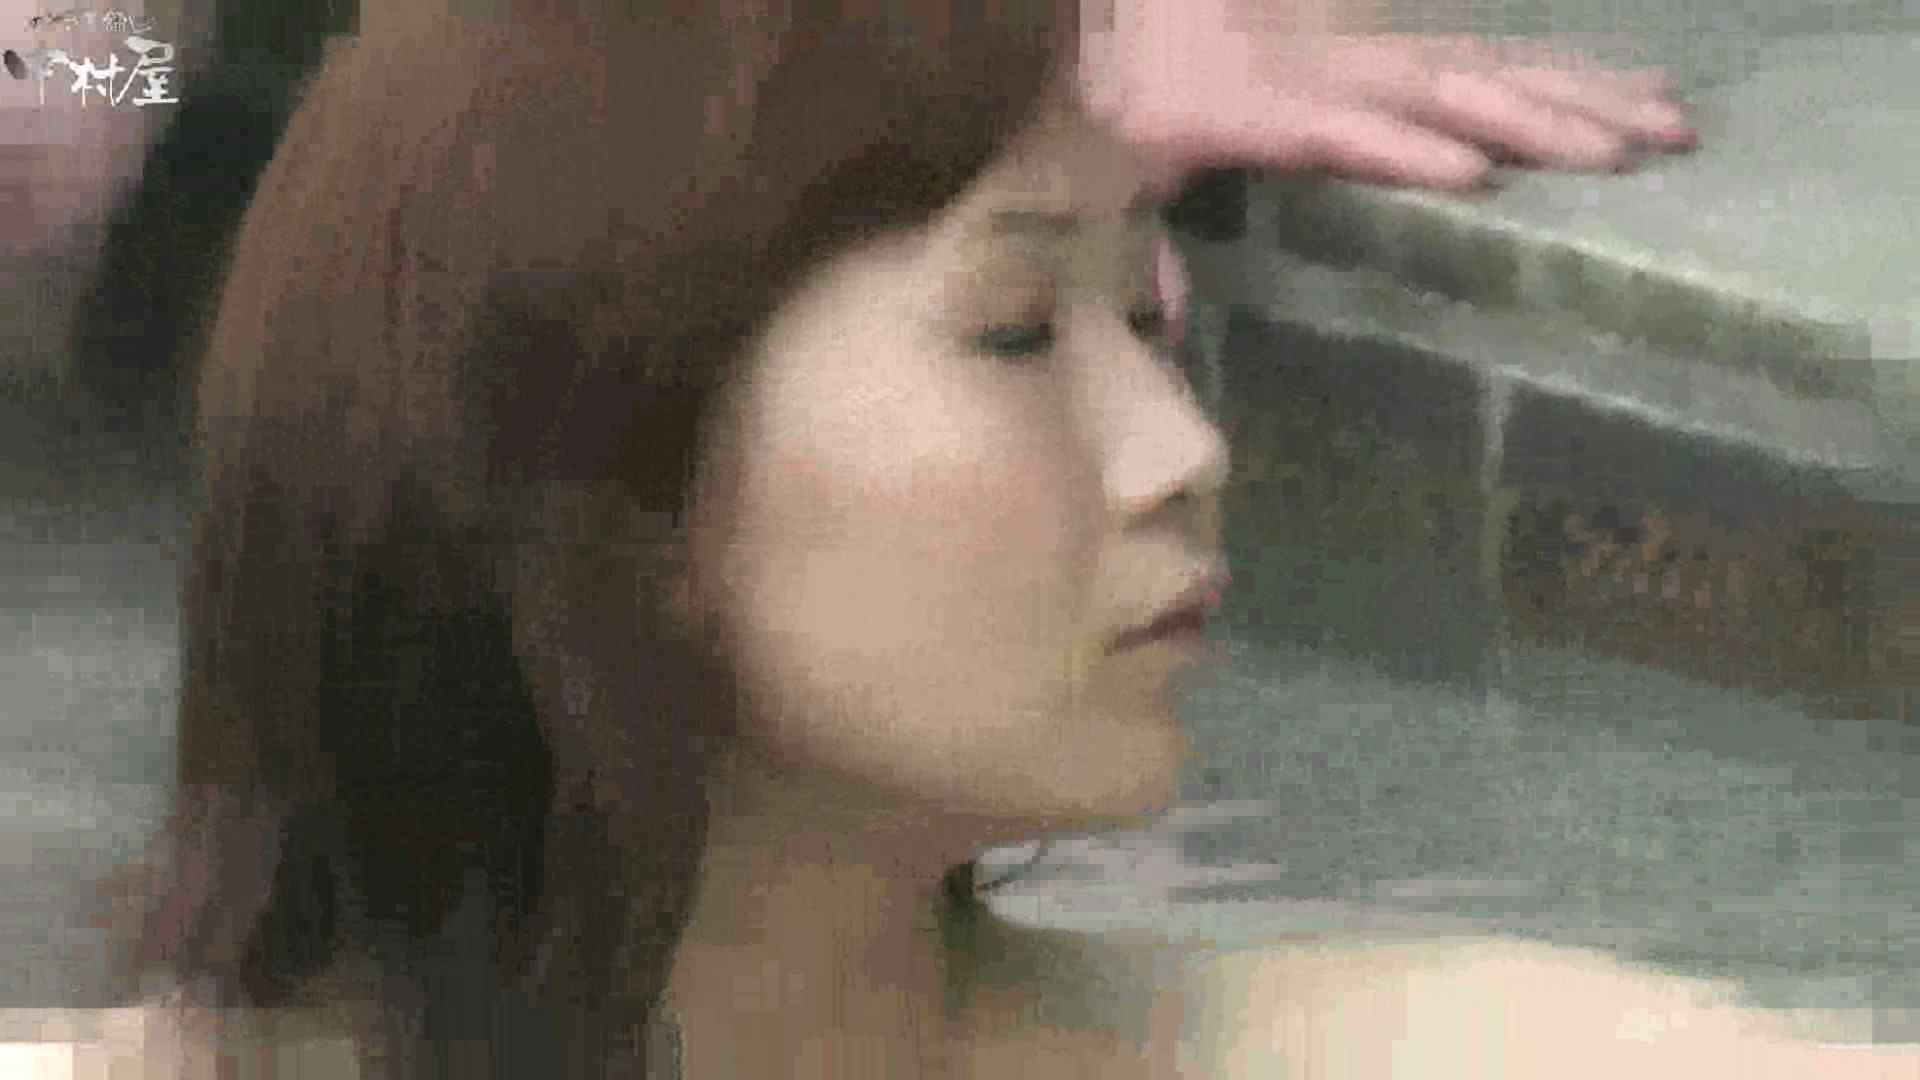 Aquaな露天風呂Vol.877潜入盗撮露天風呂十三判湯 其の二 露天 ワレメ無修正動画無料 106pic 77